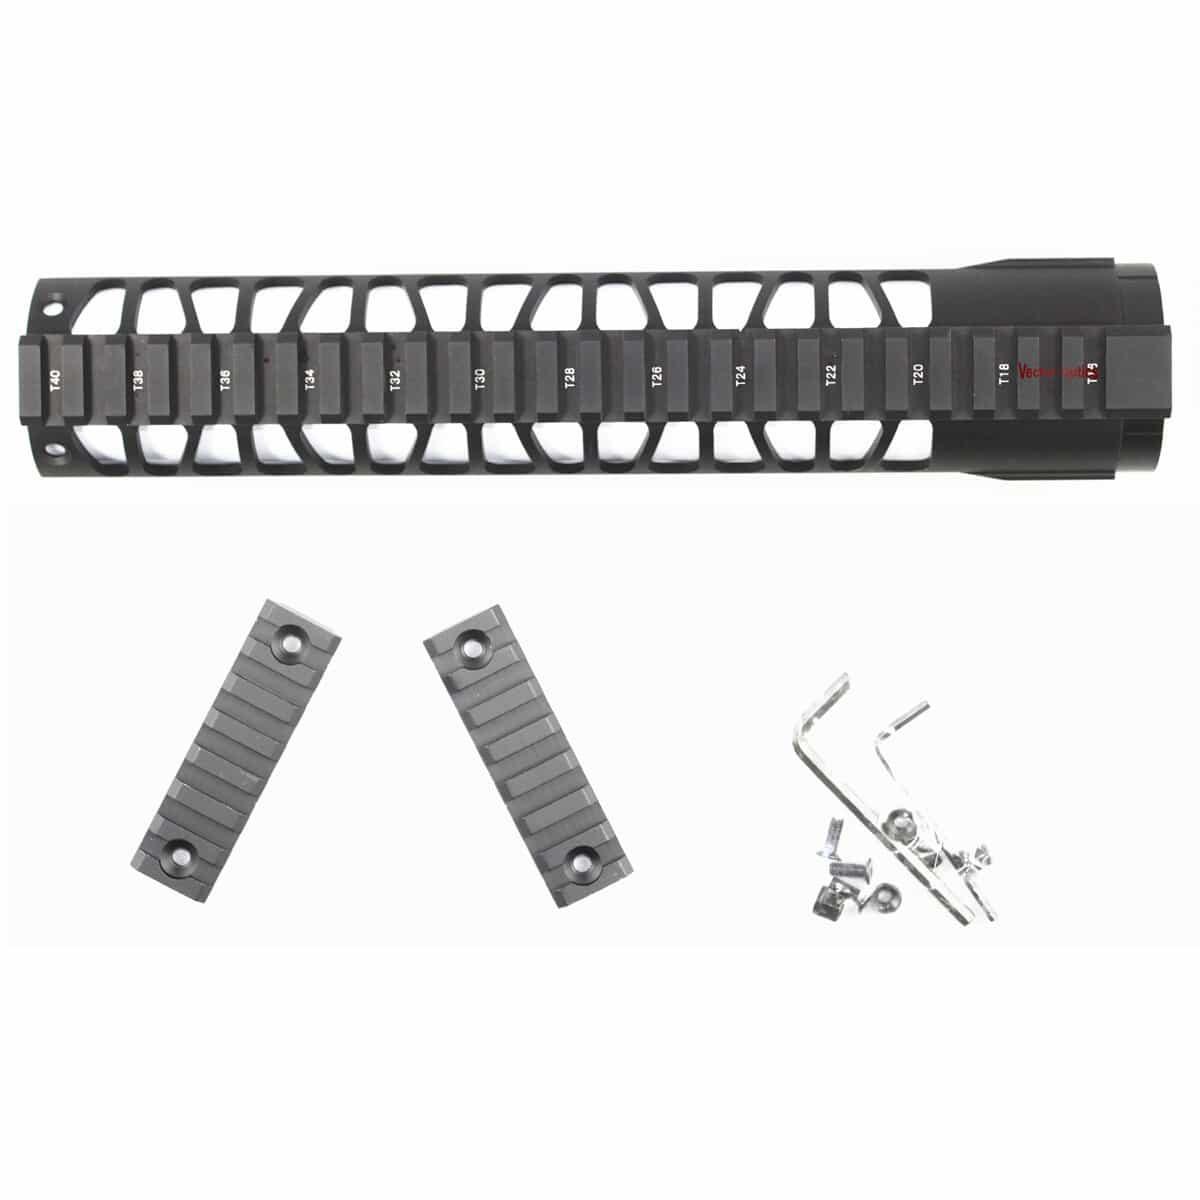 Key Mod Free Float 10'' Handguard Rail Mount